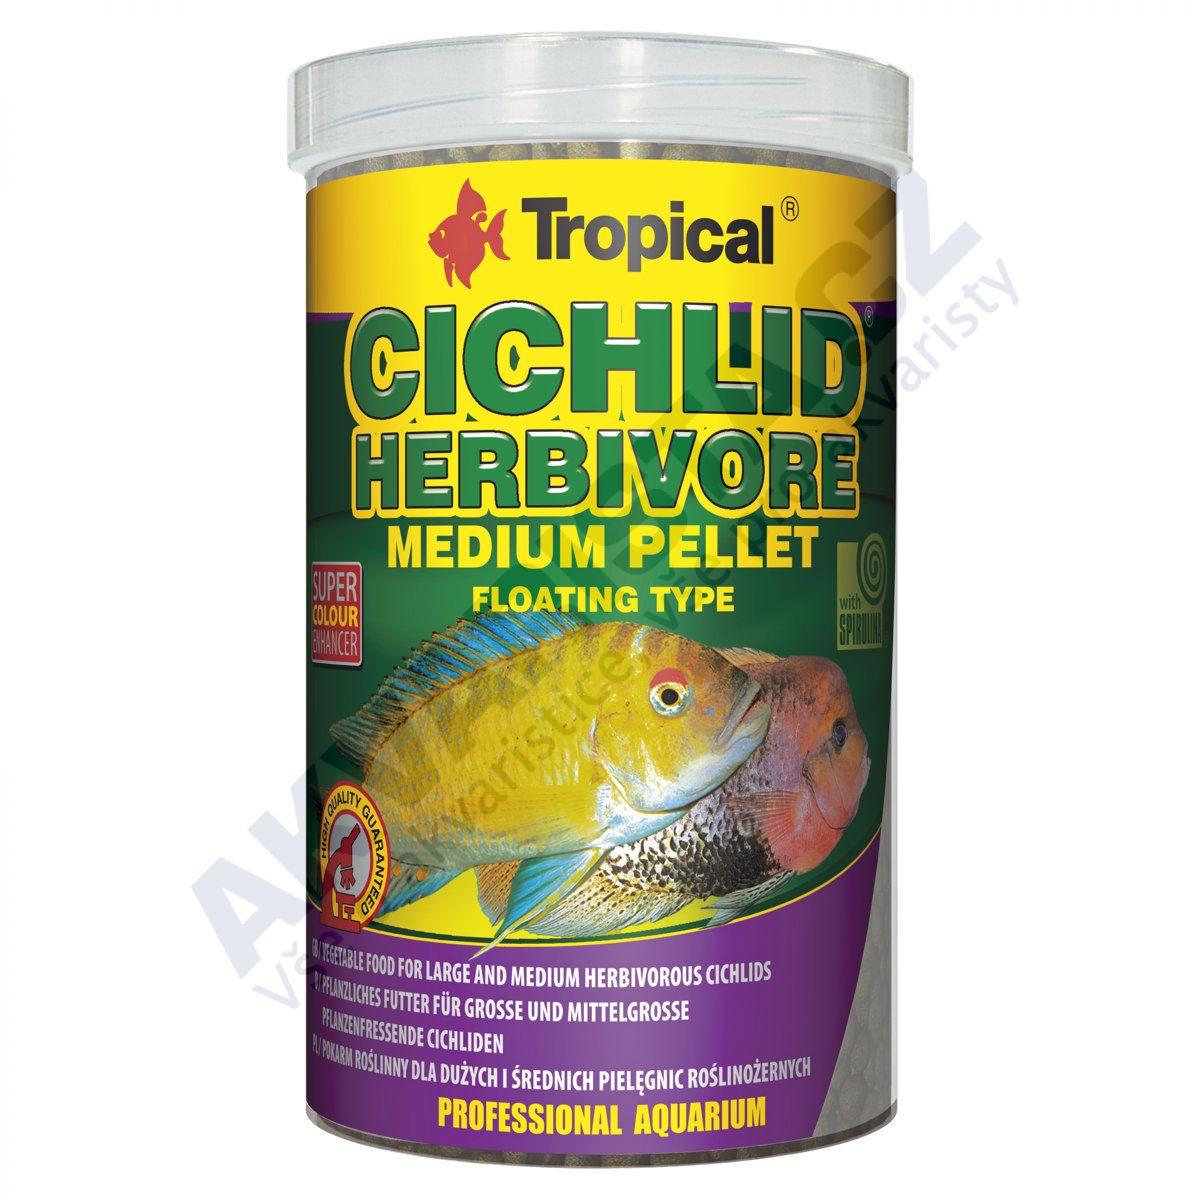 Tropical Cichlid Herbivore M pellet 1000 ml